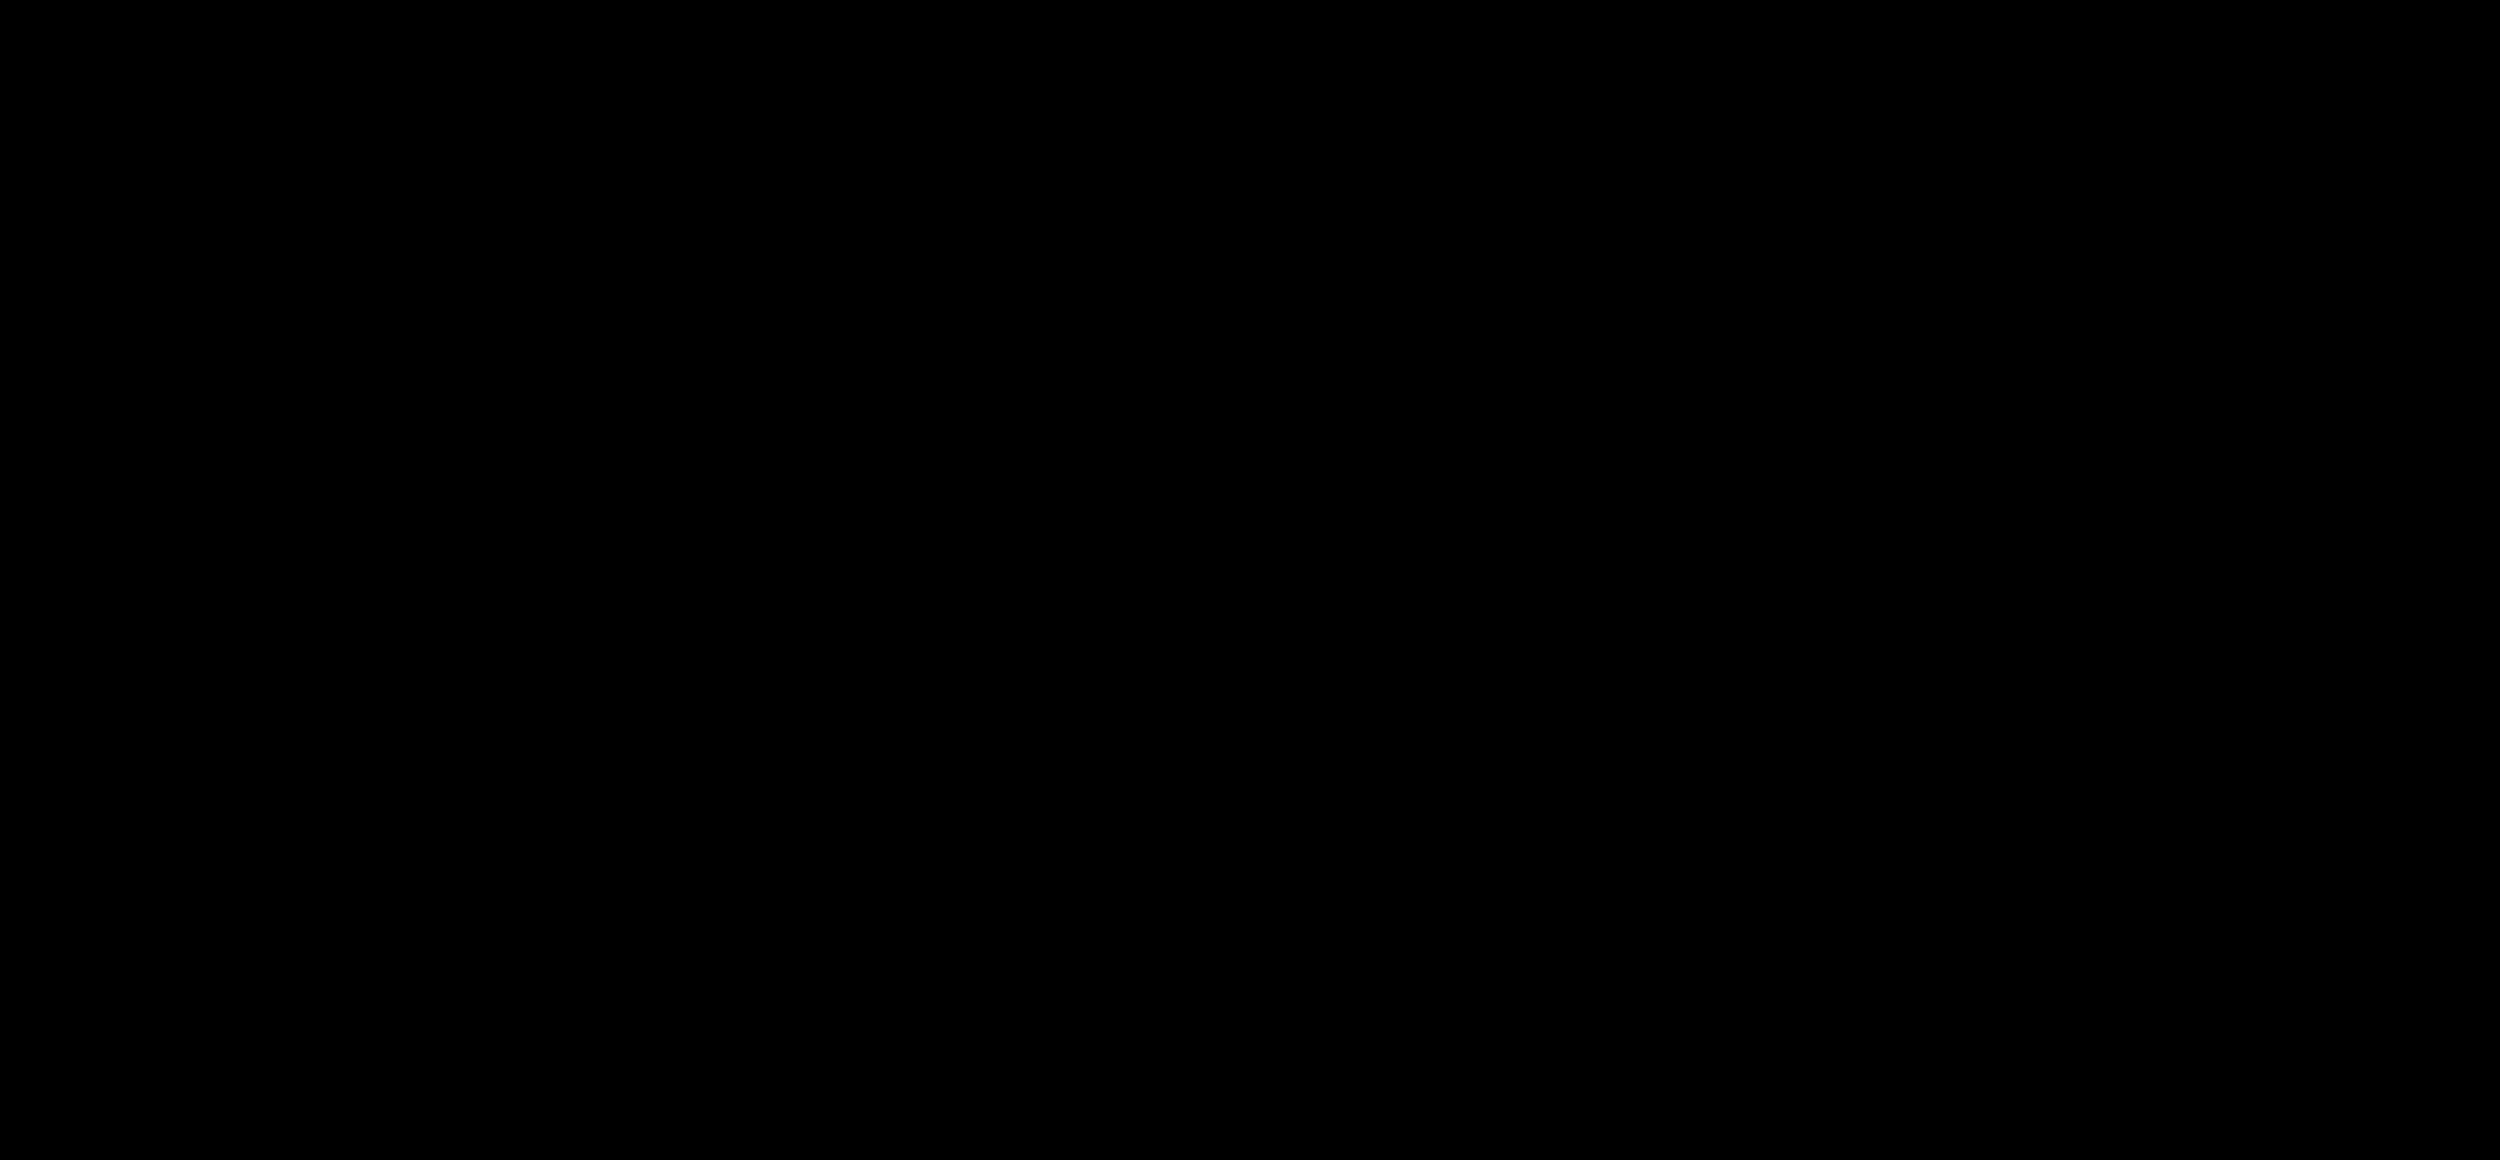 Sphynx_Logotype-05.png